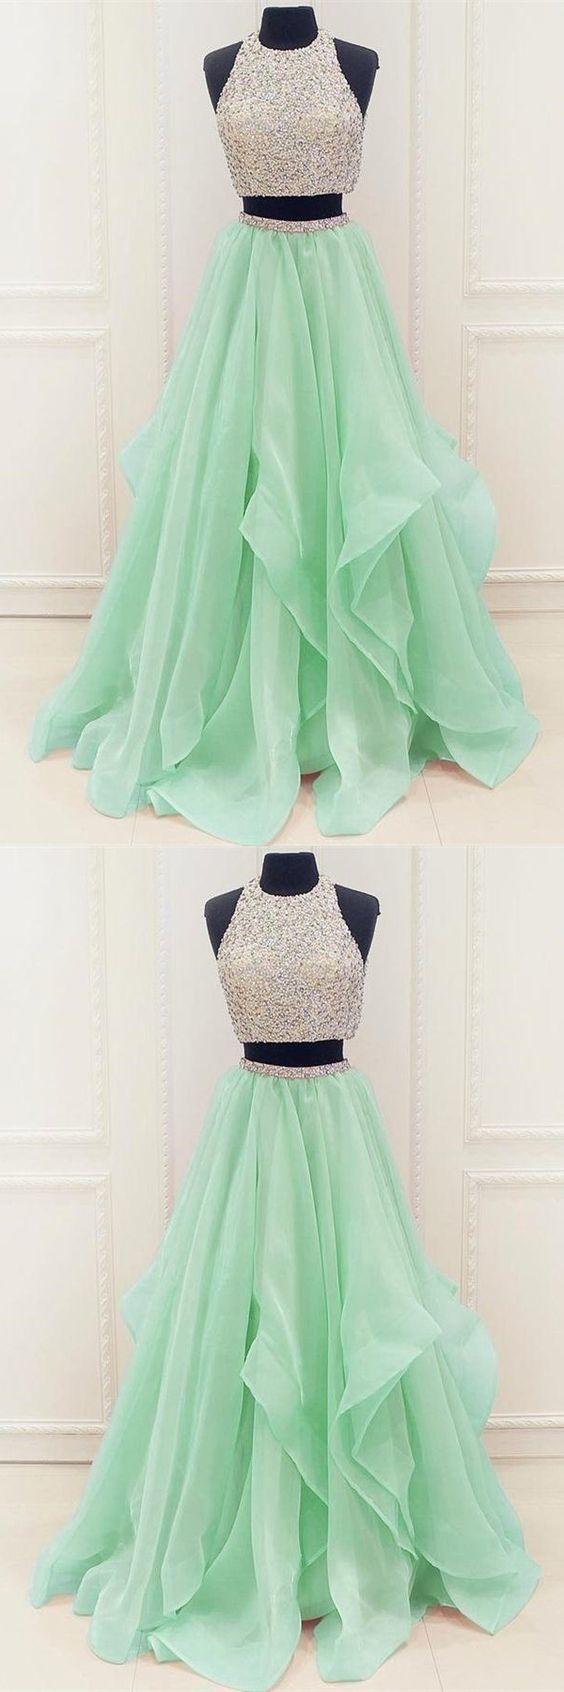 Zweiteiliges Abendkleid, mintgrünes Tüll langes Abendkleid